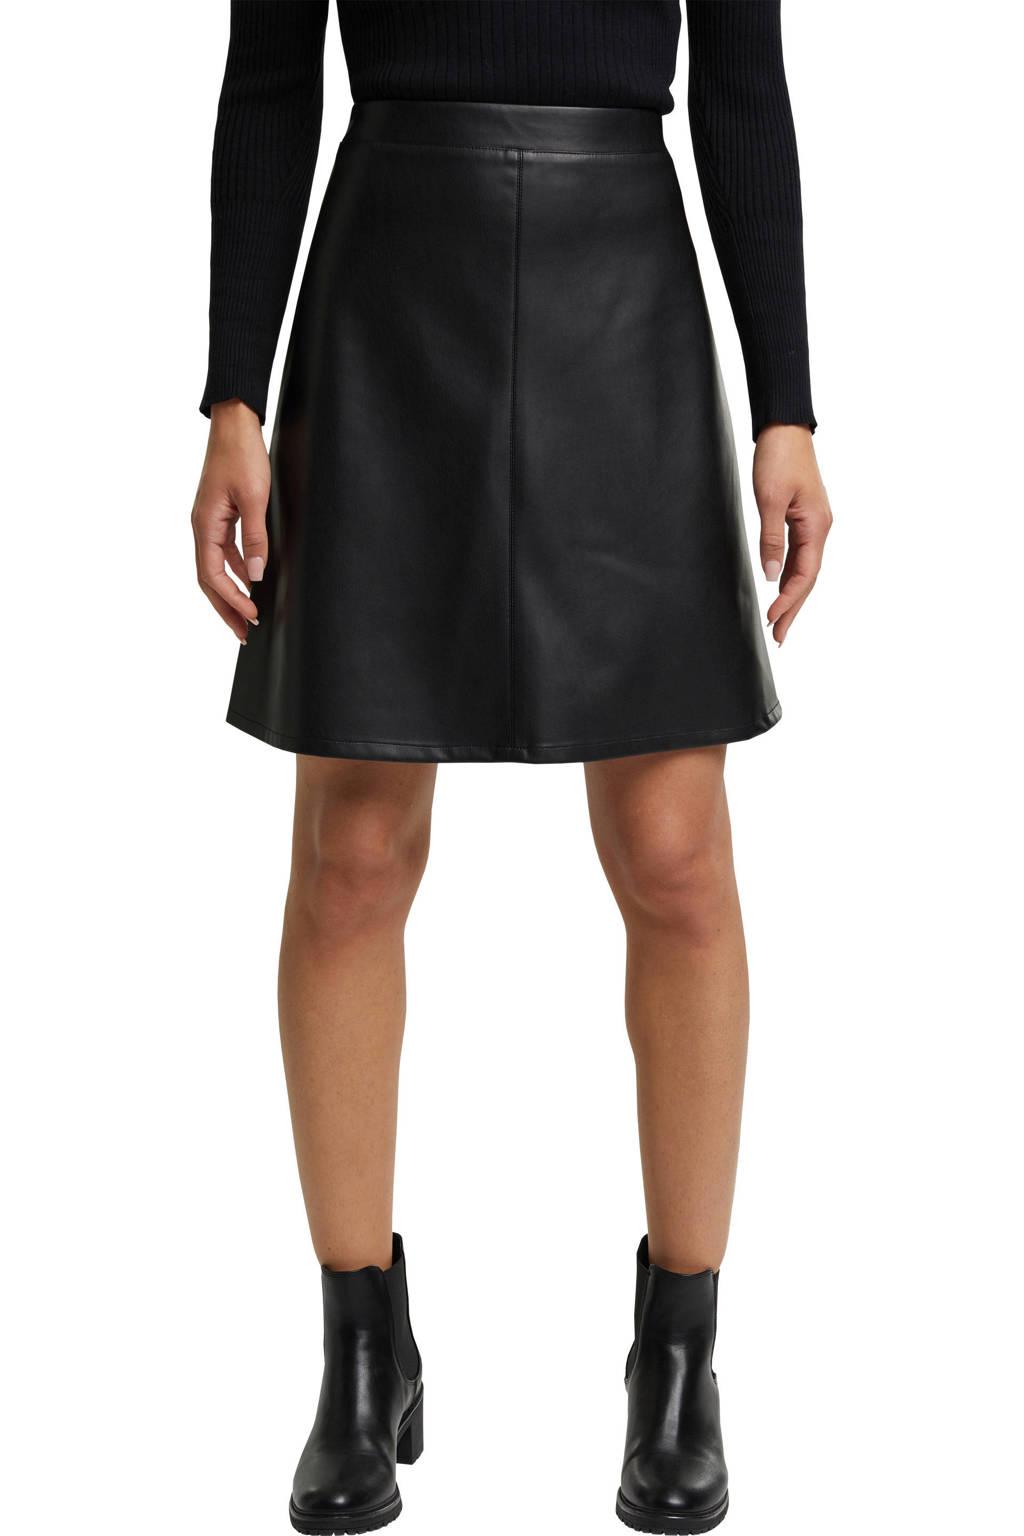 ESPRIT Women Casual coated rok zwart, Zwart